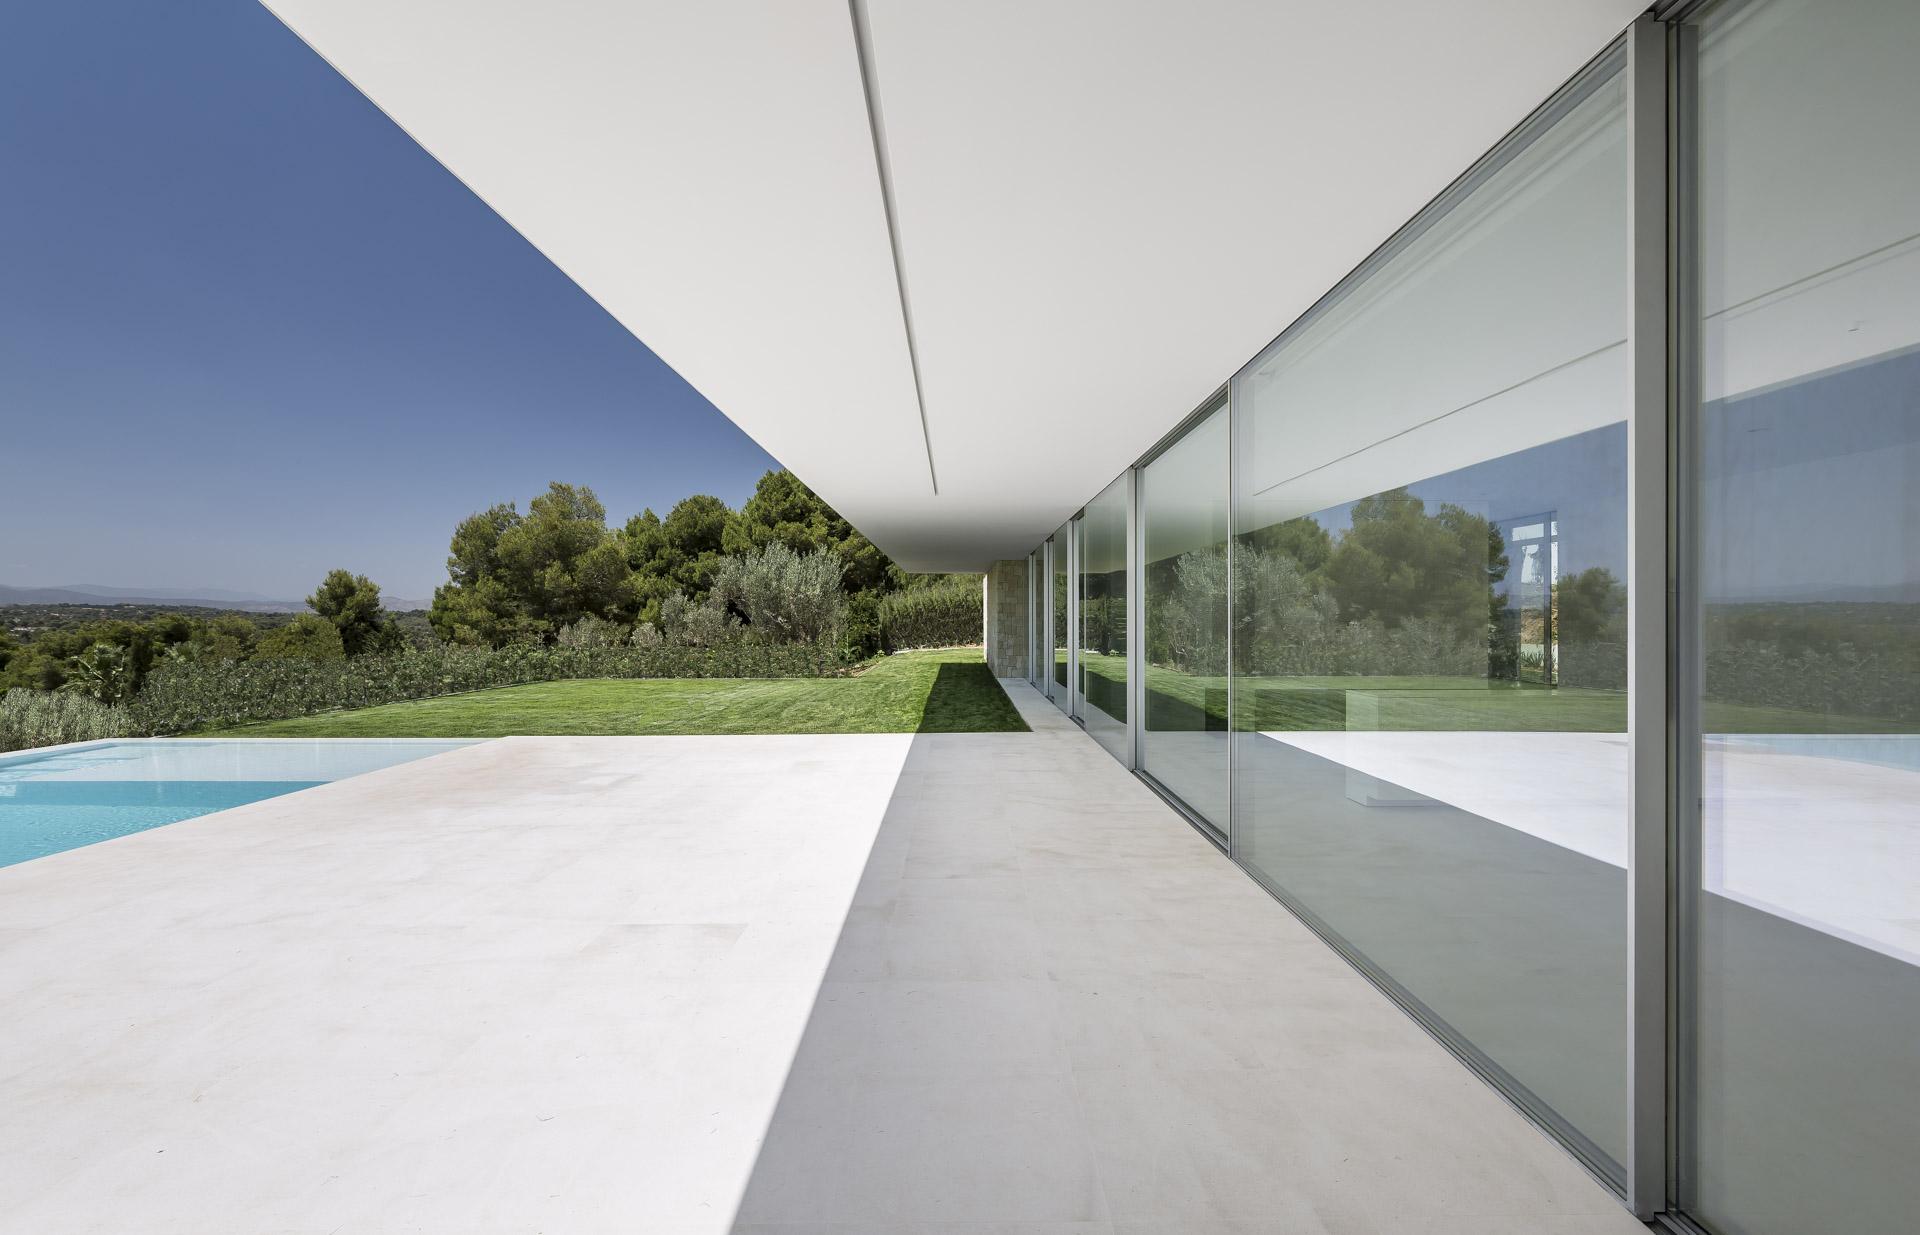 fotografia-arquitectura-valencia-german-cabo-gallardo-llopis-villamarchante-vivienda-19